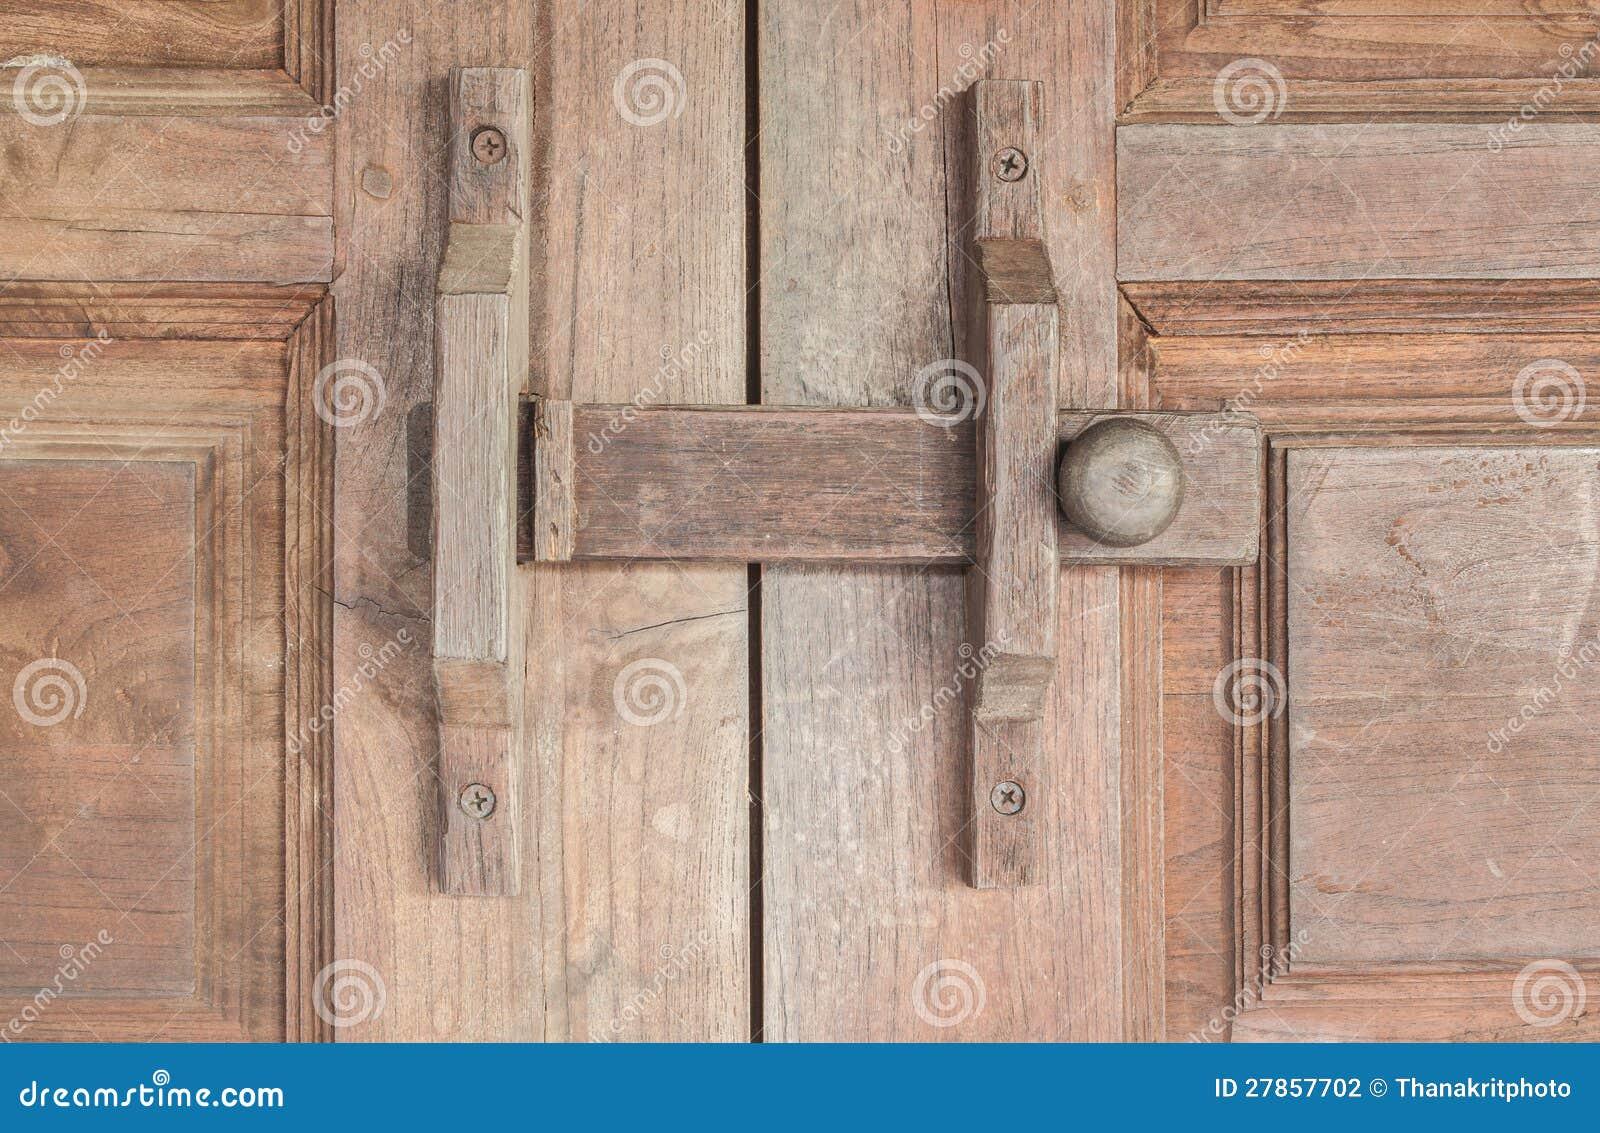 Wooden Lock Latch On Wooden Doors Stock Photo Image